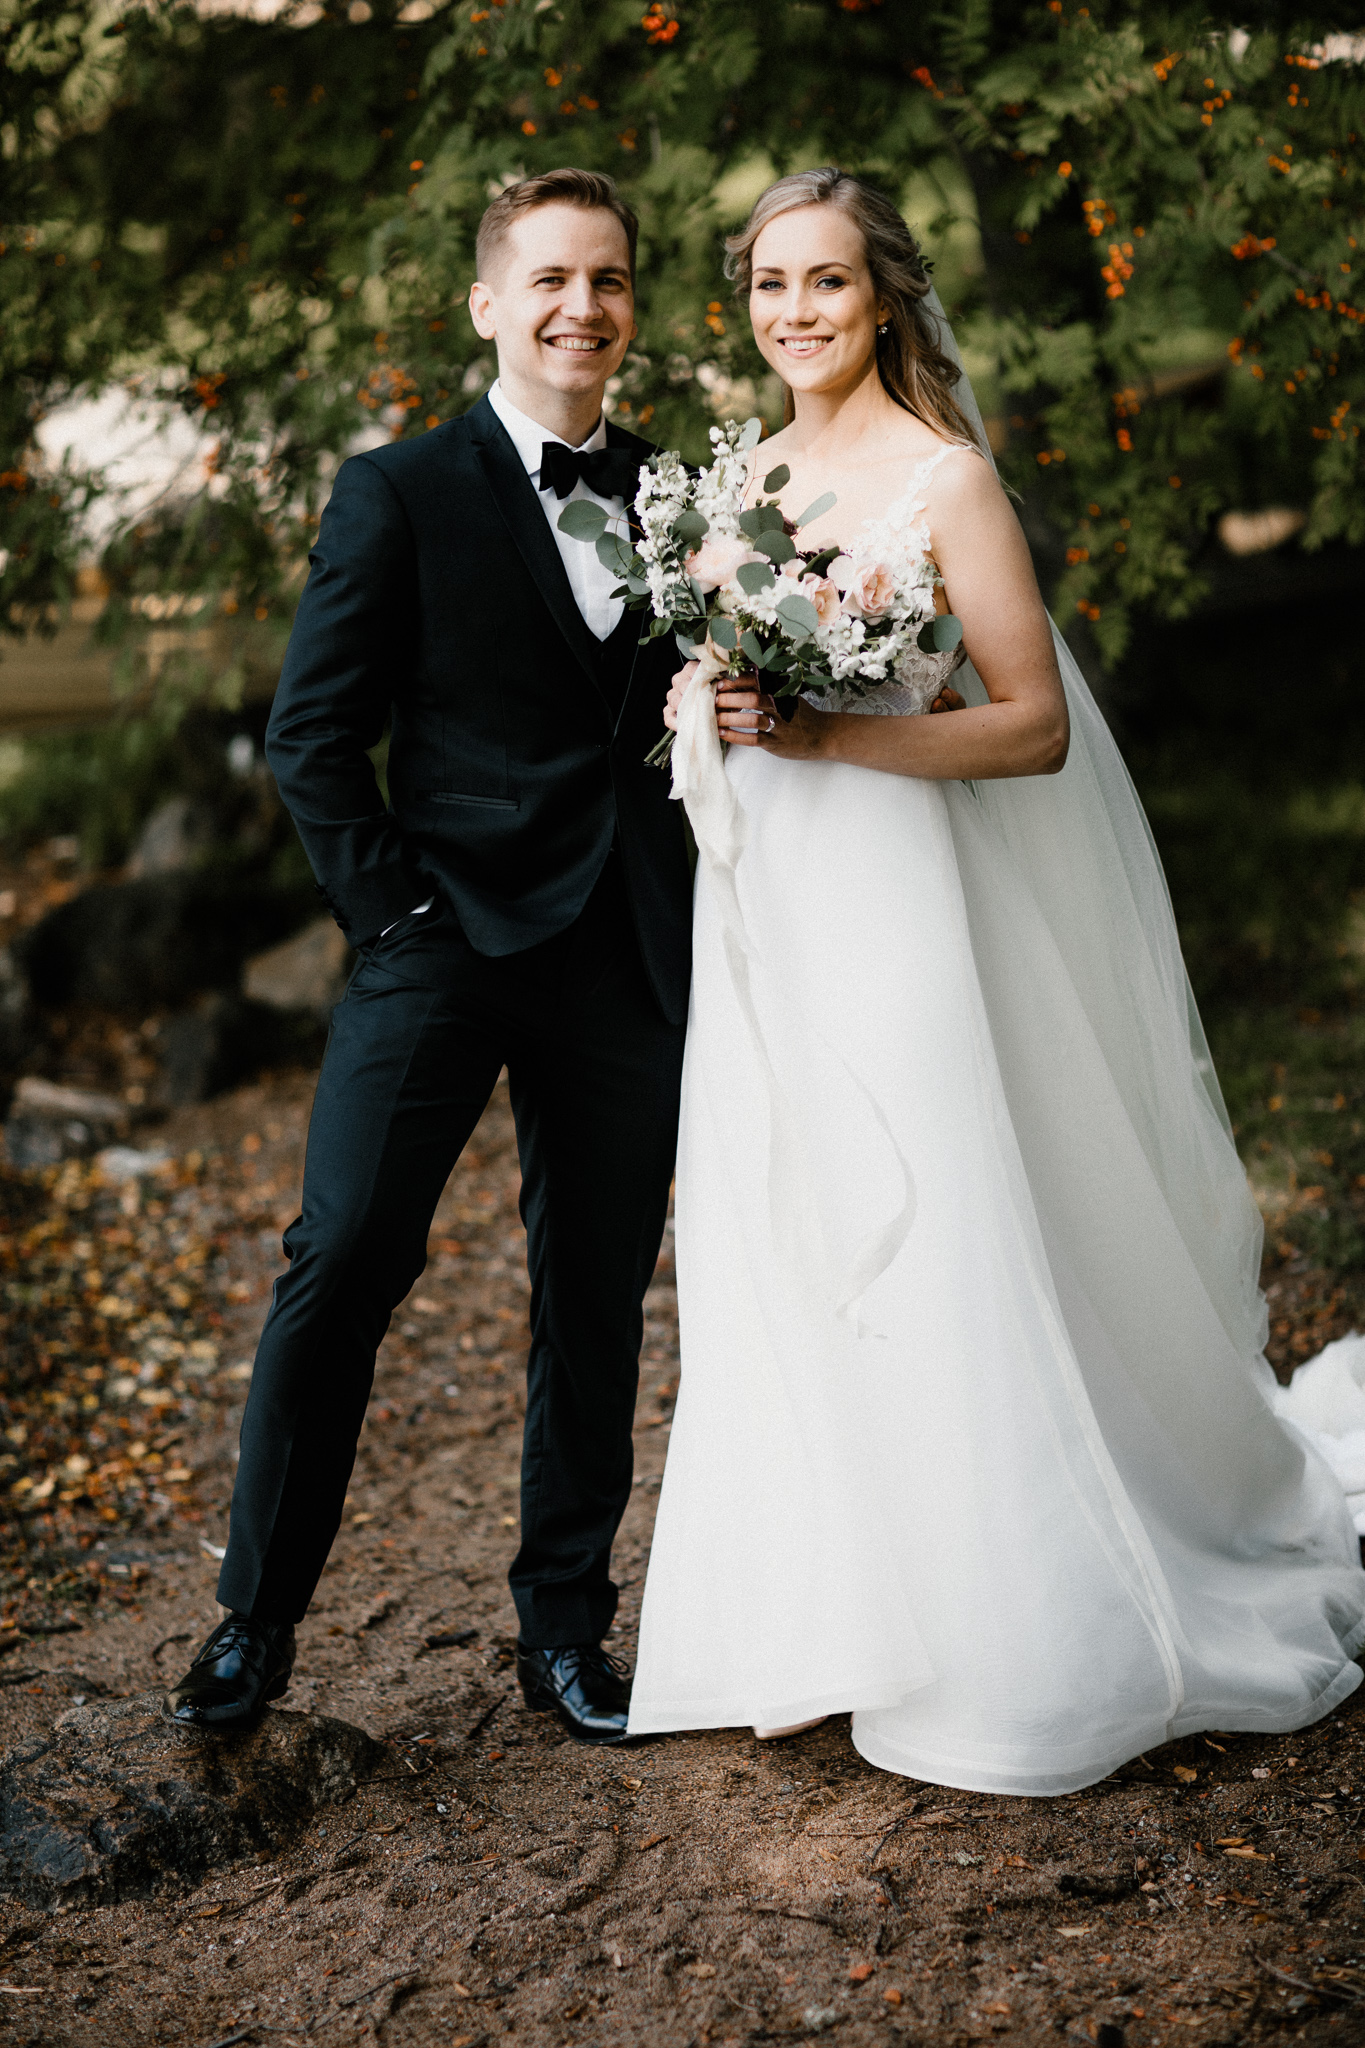 Johanna + Mikko - Tampere - Photo by Patrick Karkkolainen Wedding Photographer-39.jpg